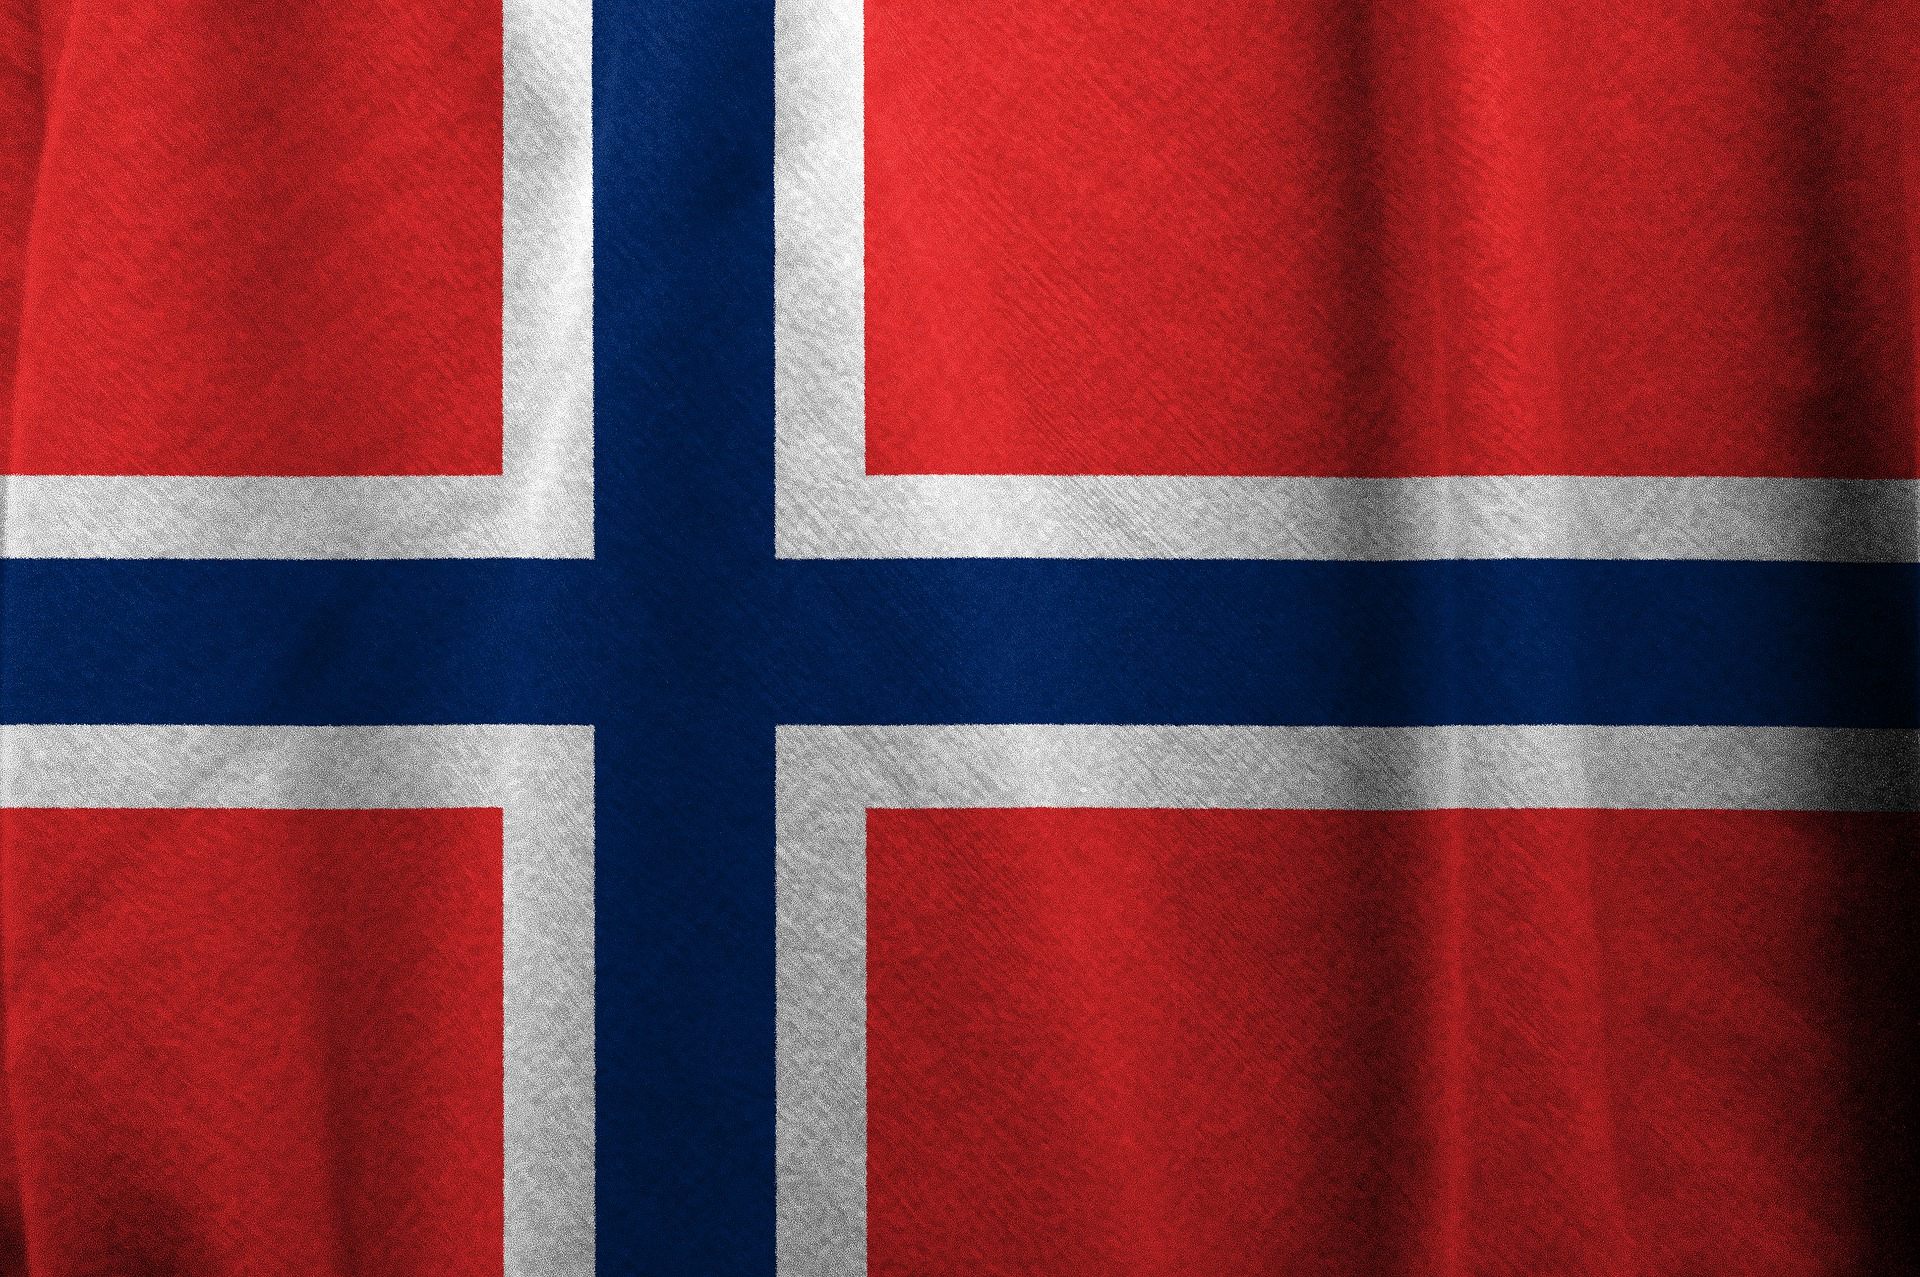 Trademark registration Norway